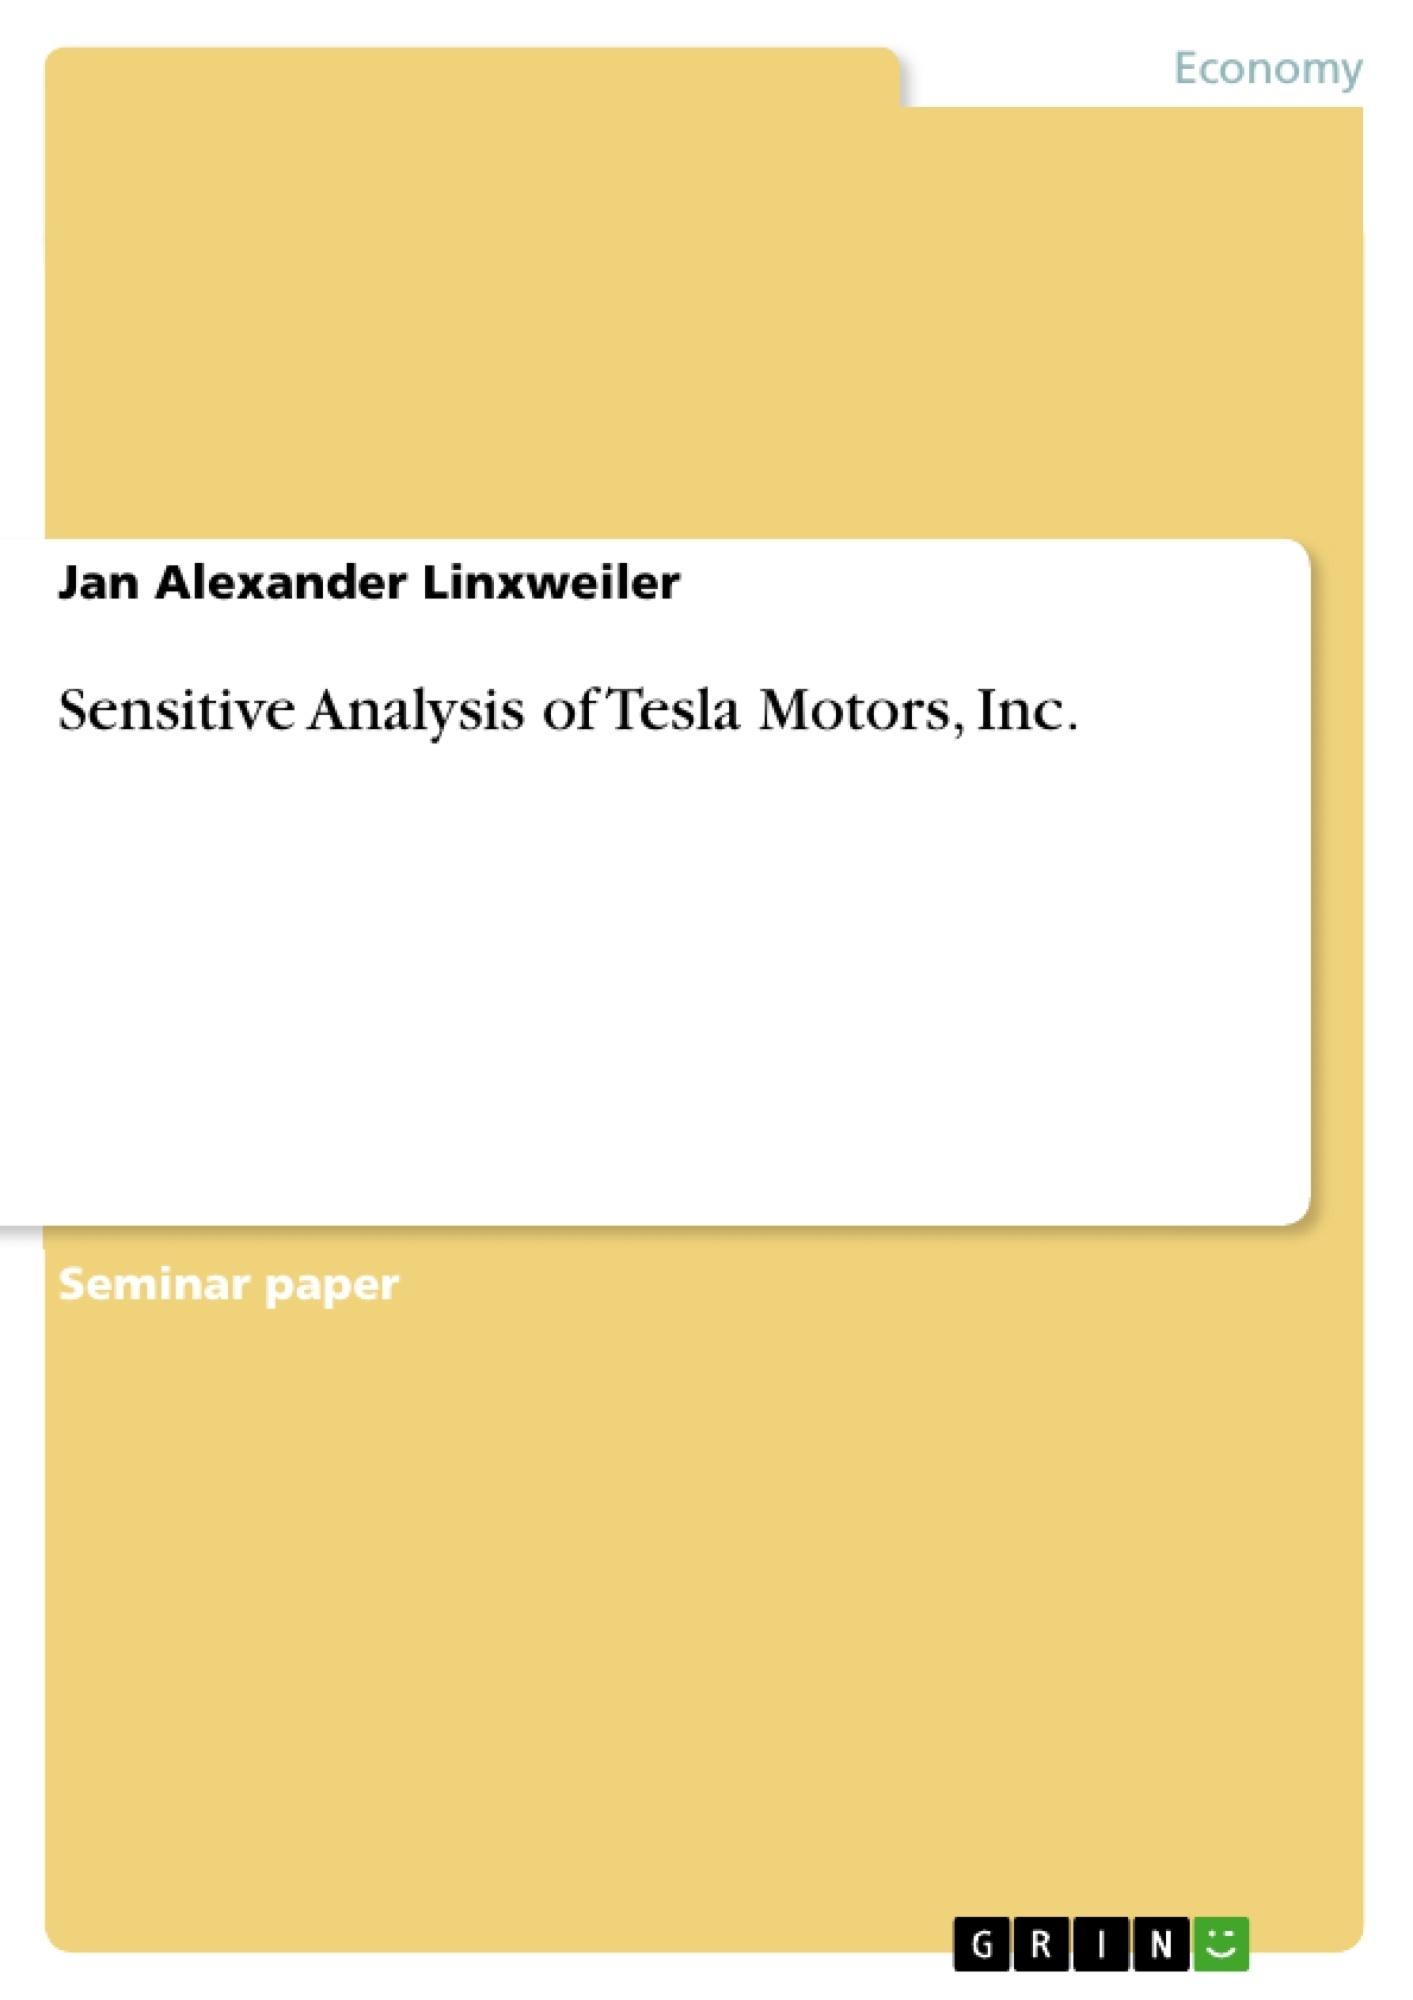 the industrial revolution essay ks3 scheme